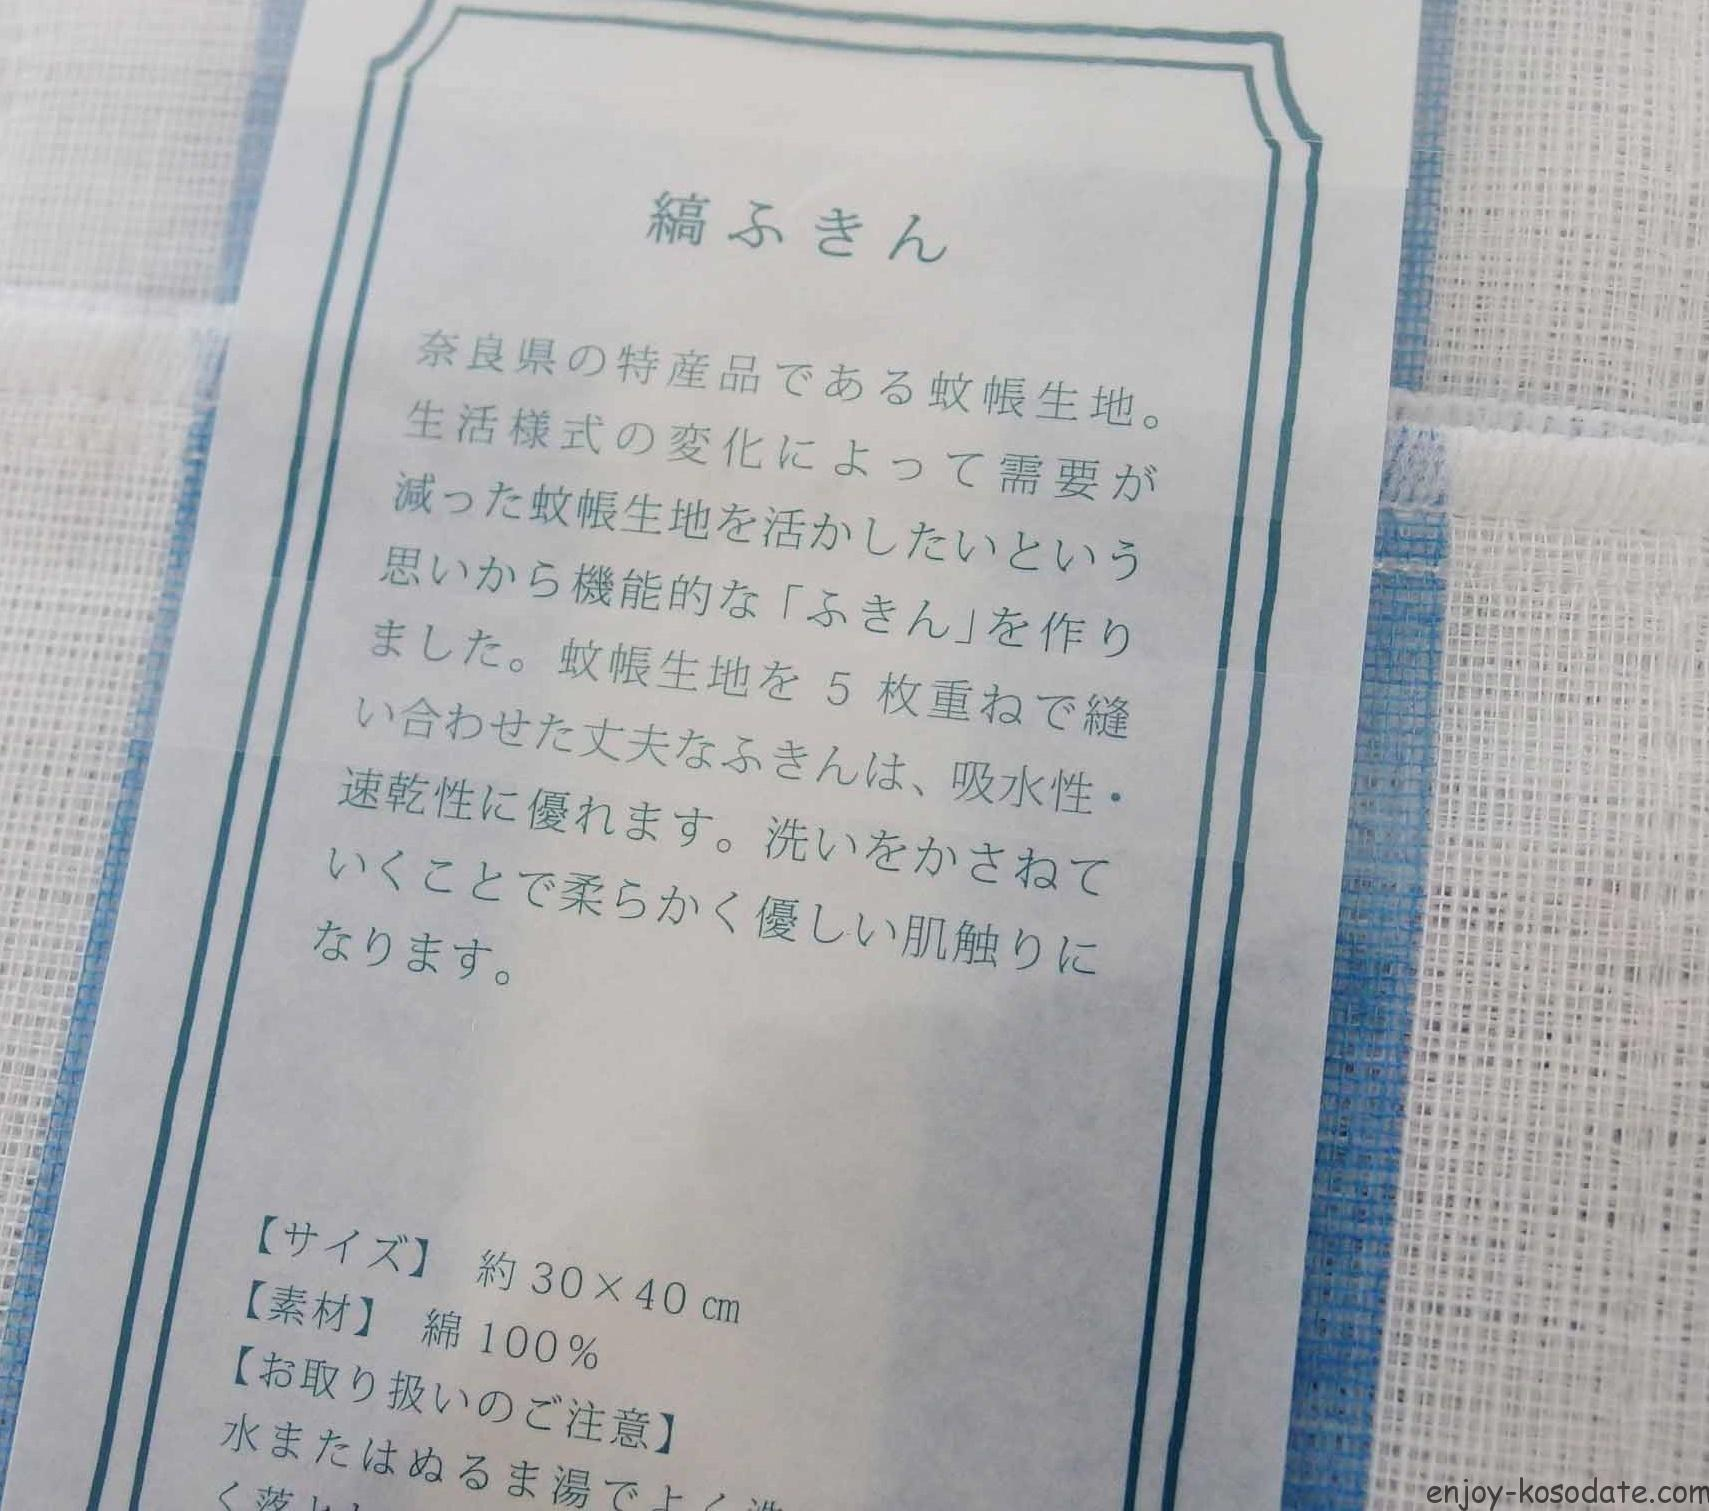 IMGP1234 - コピー